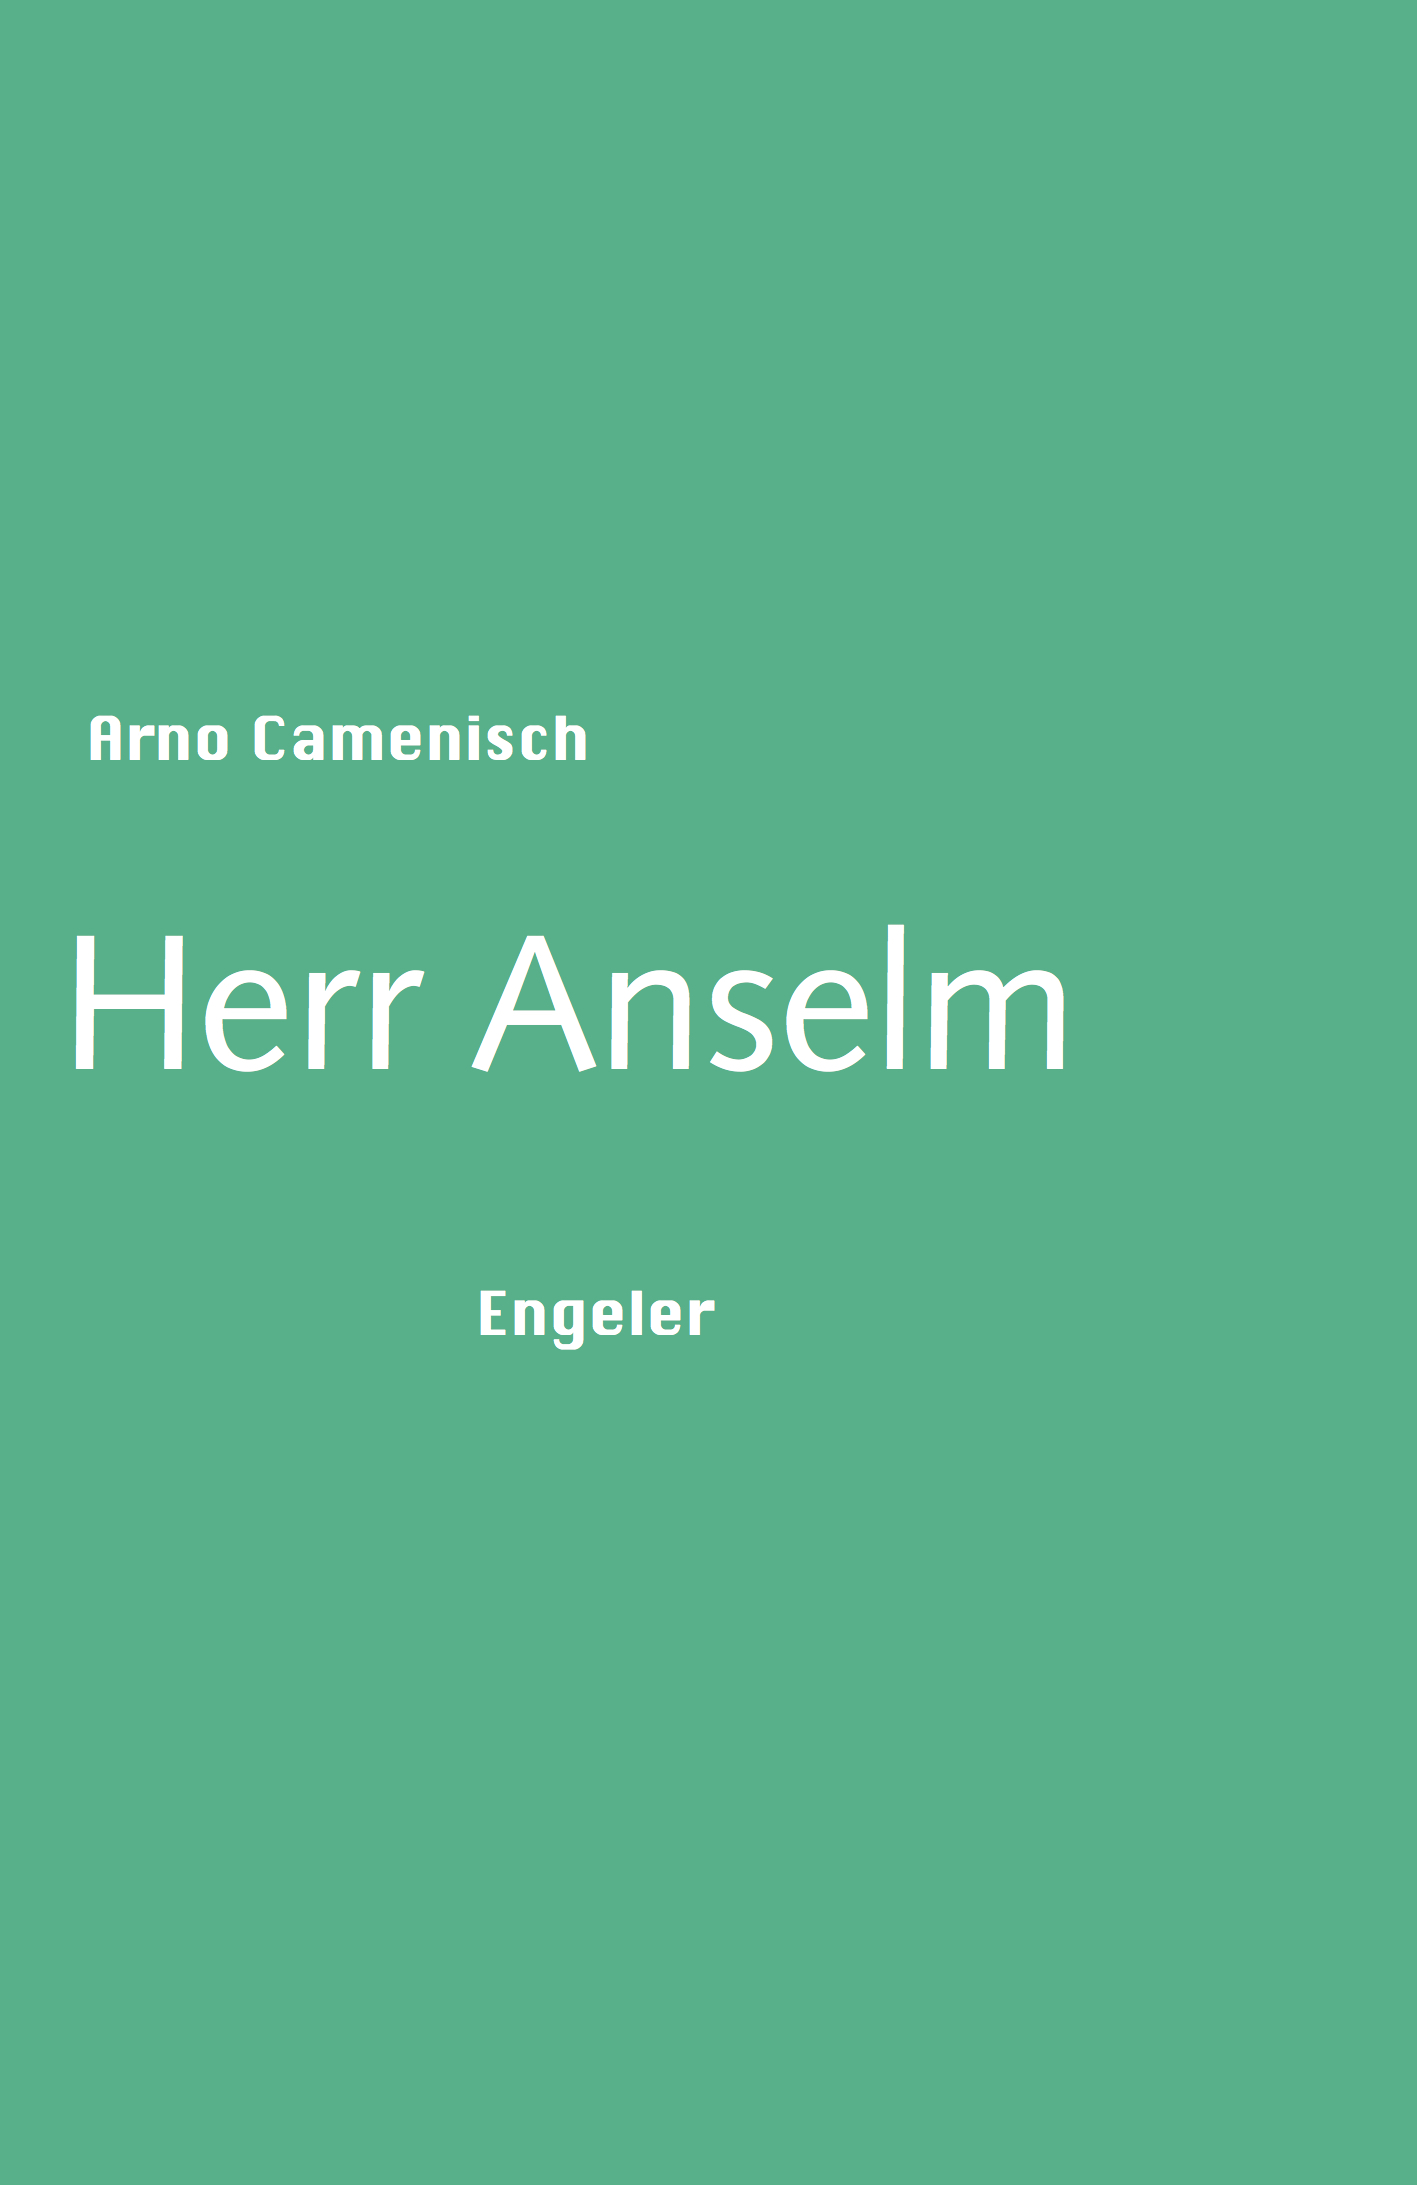 Arno Camenisch: «Herr Anselm»